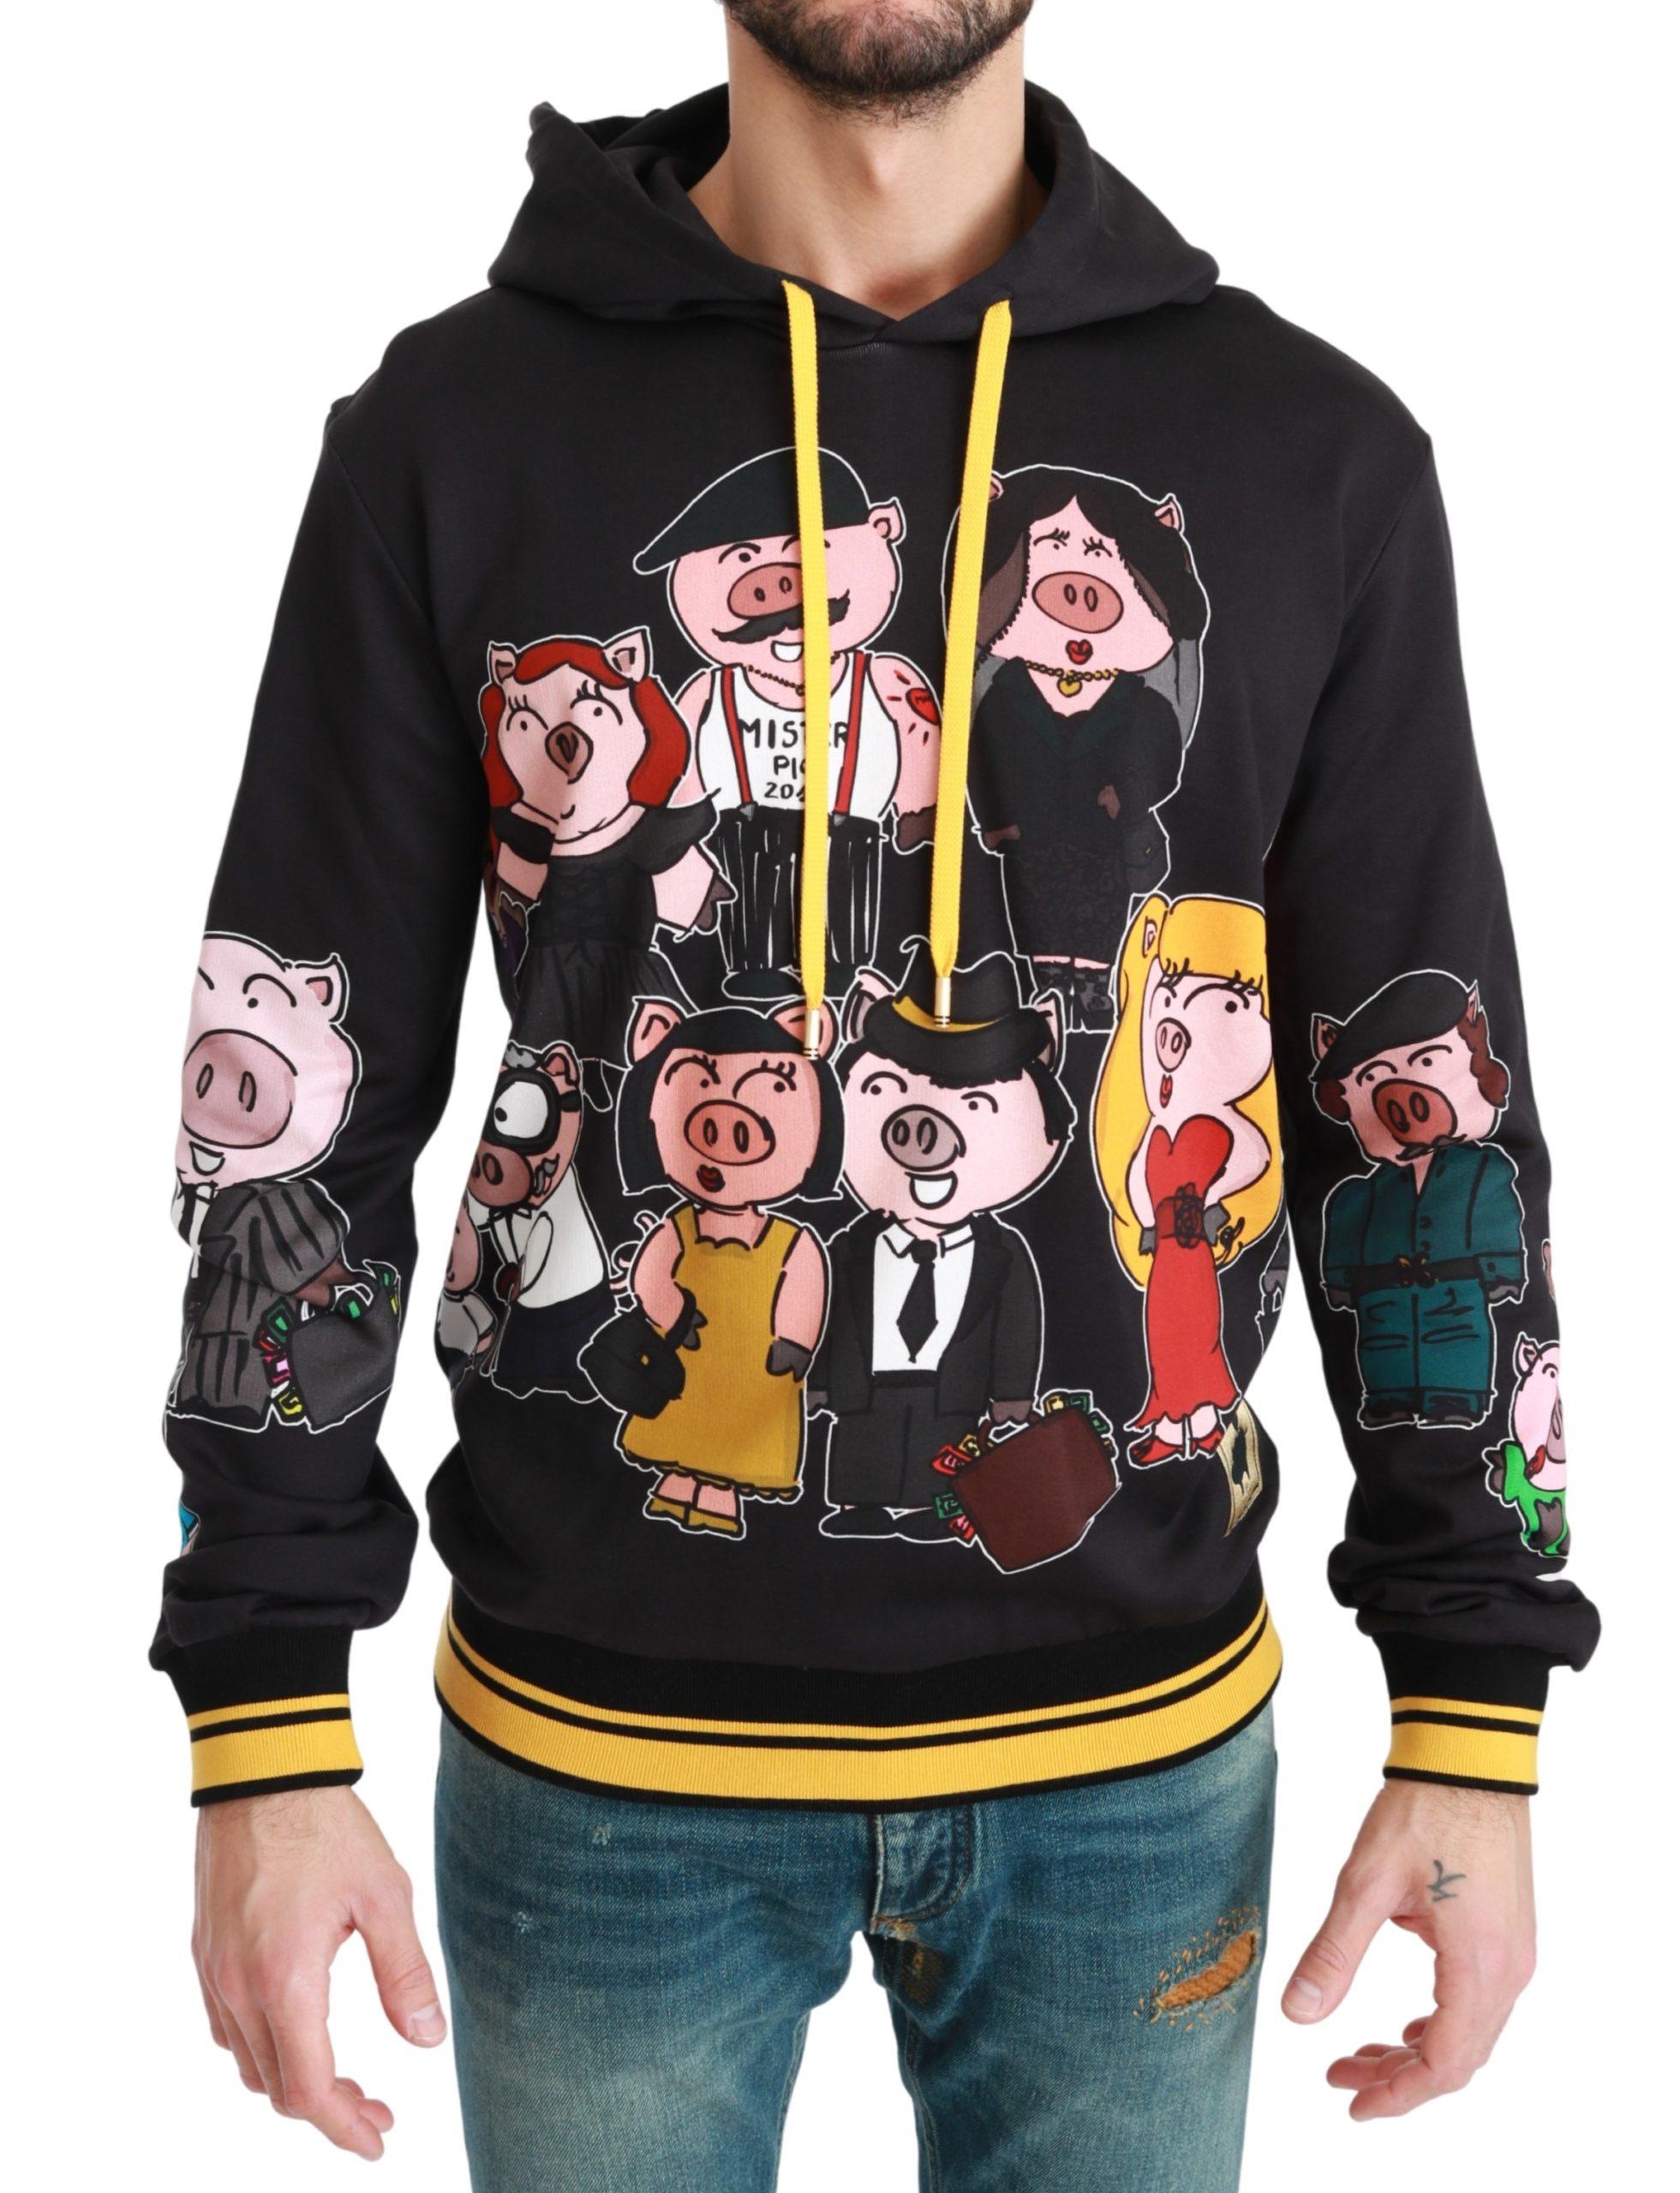 Dolce & Gabbana Men's Pig of the Year Hooded Sweater Black bgTSH4612 - IT50 | L